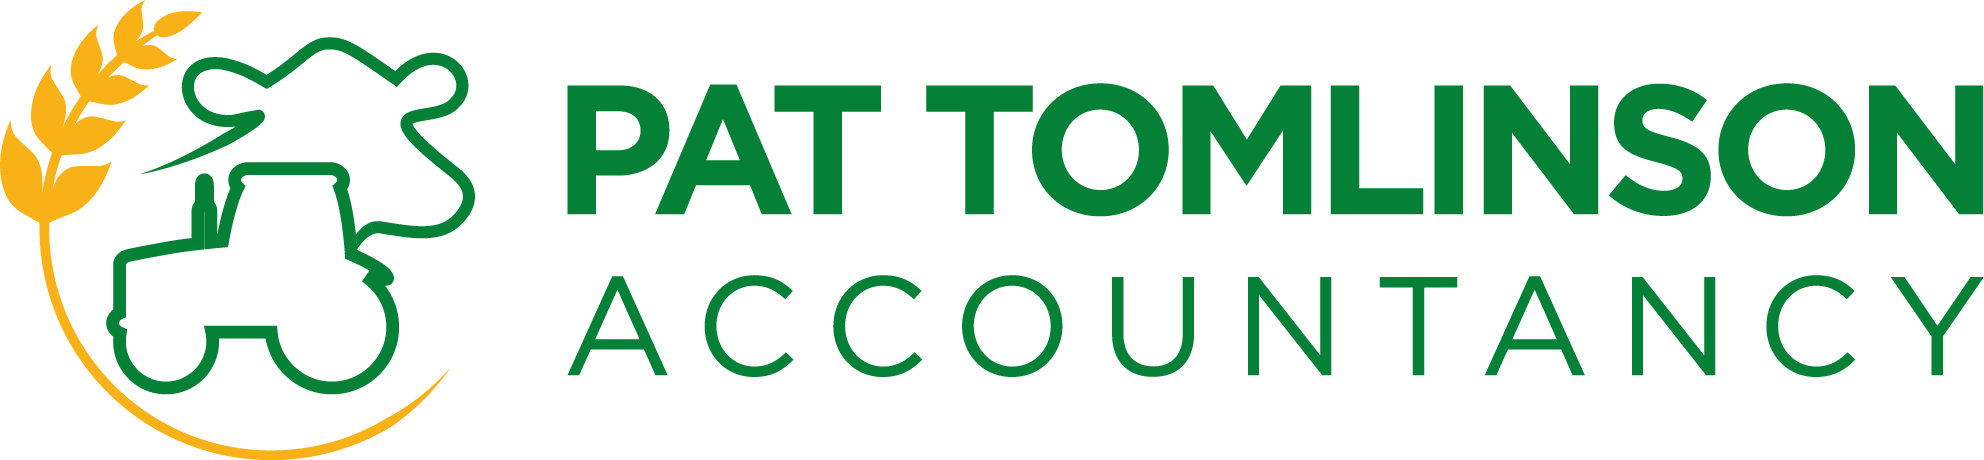 Pat Tomlinson Accountancy Logo